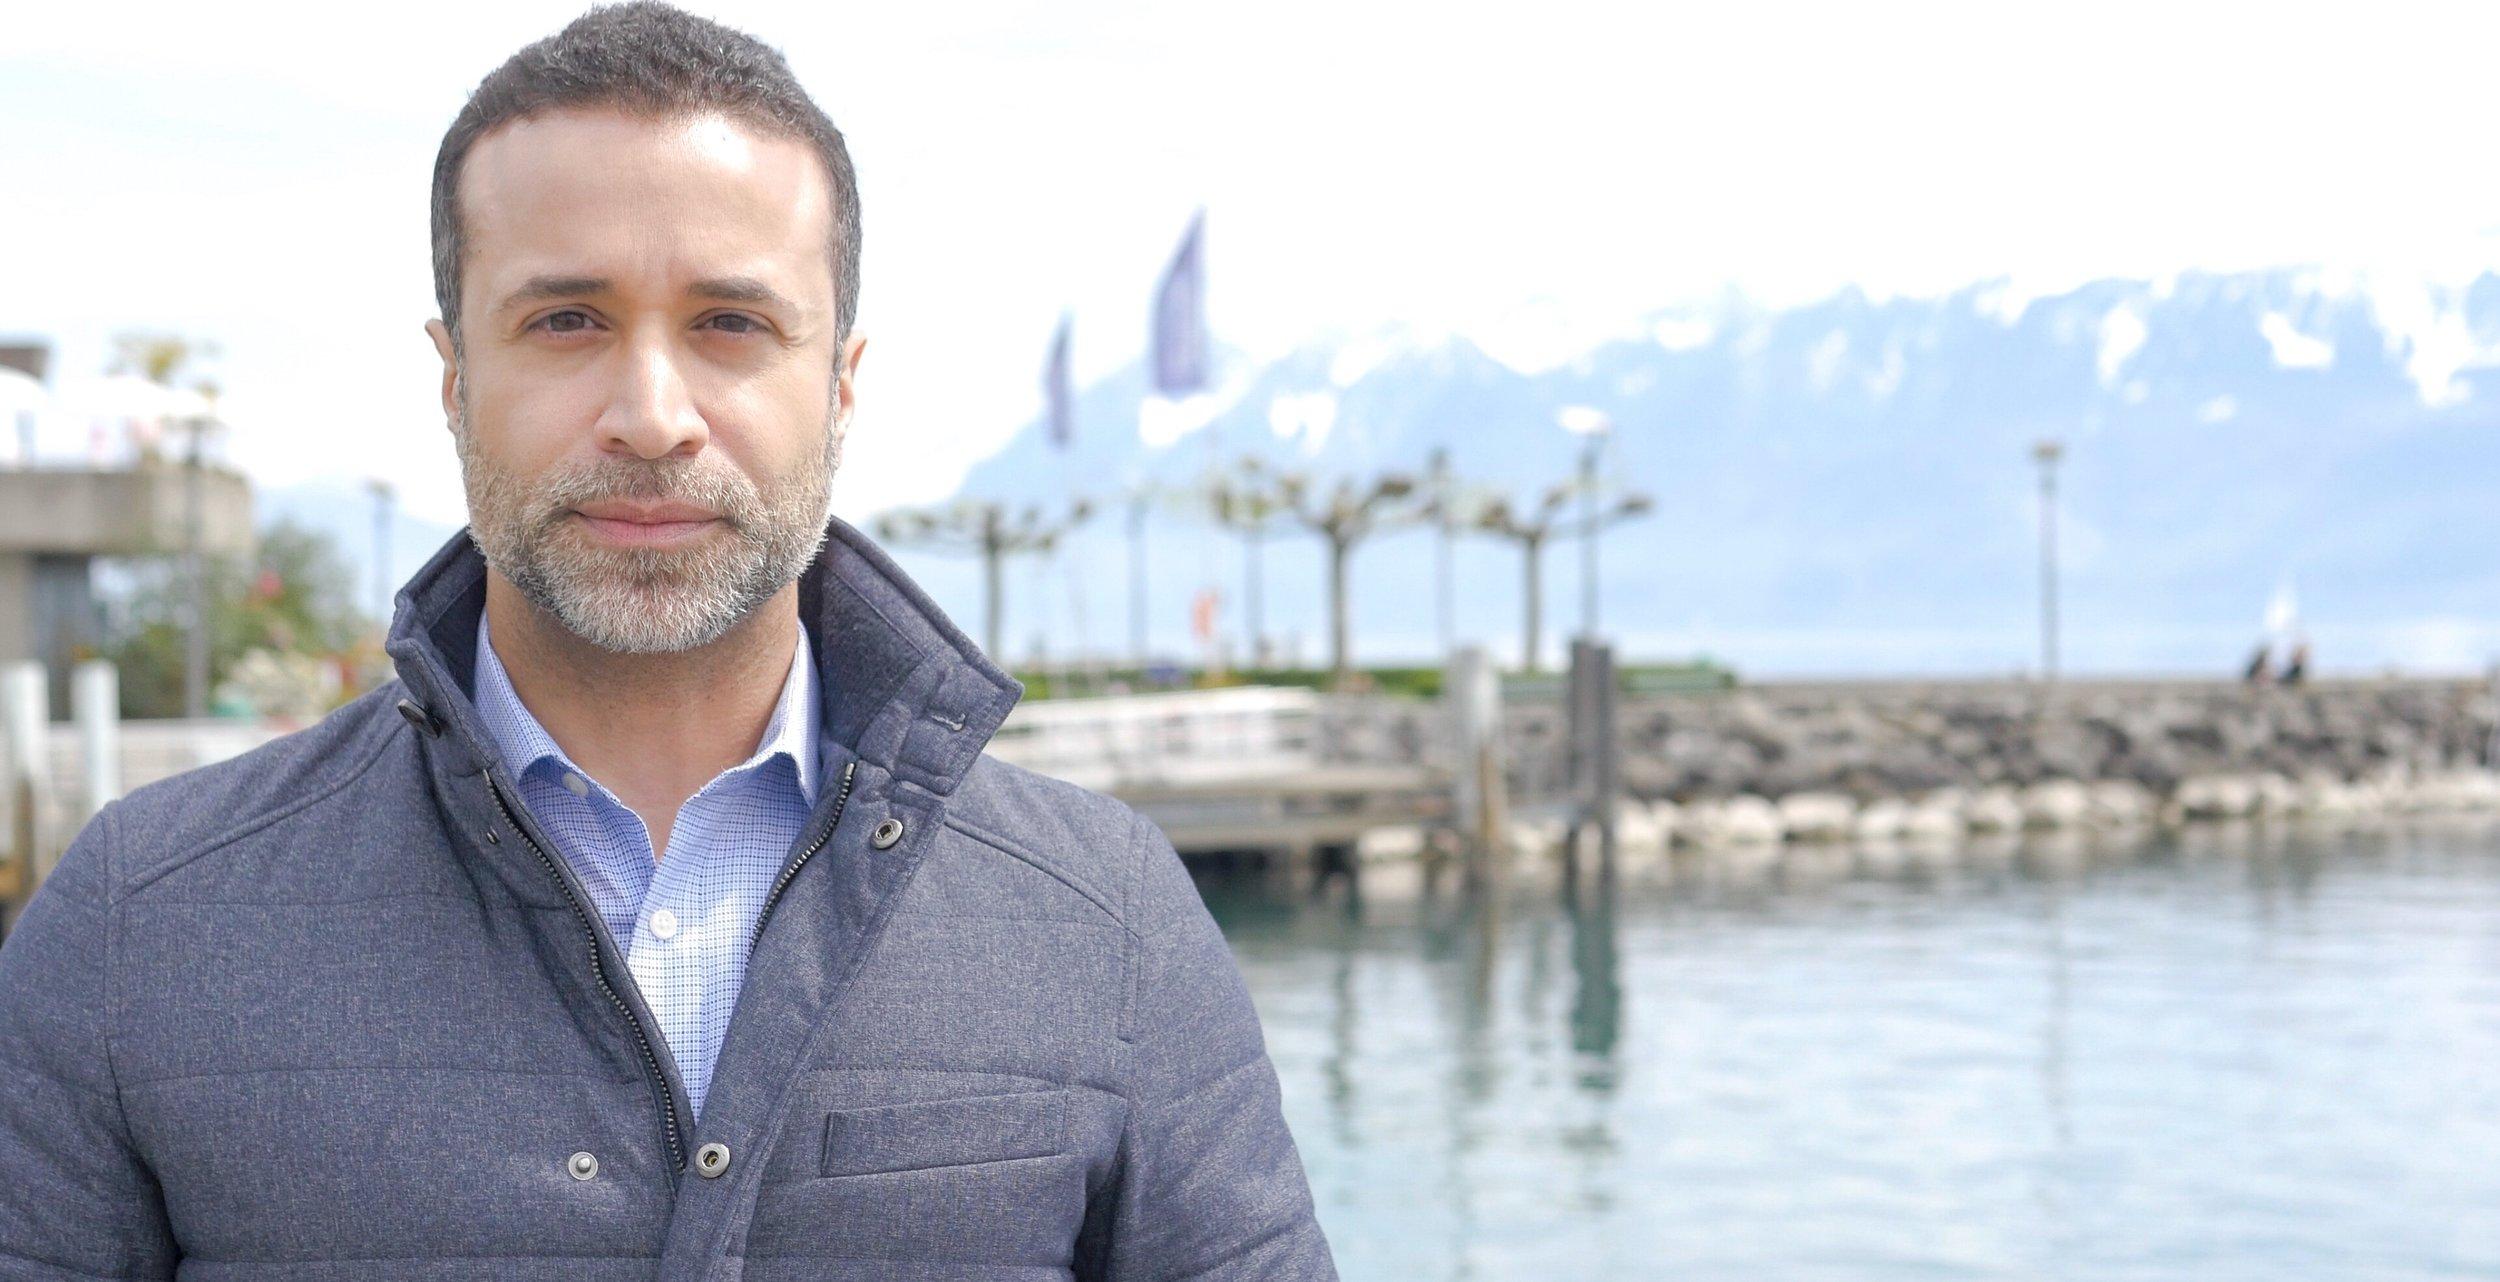 Claudio Rojas - Hurt Capital - Official Biographical Photo.jpg